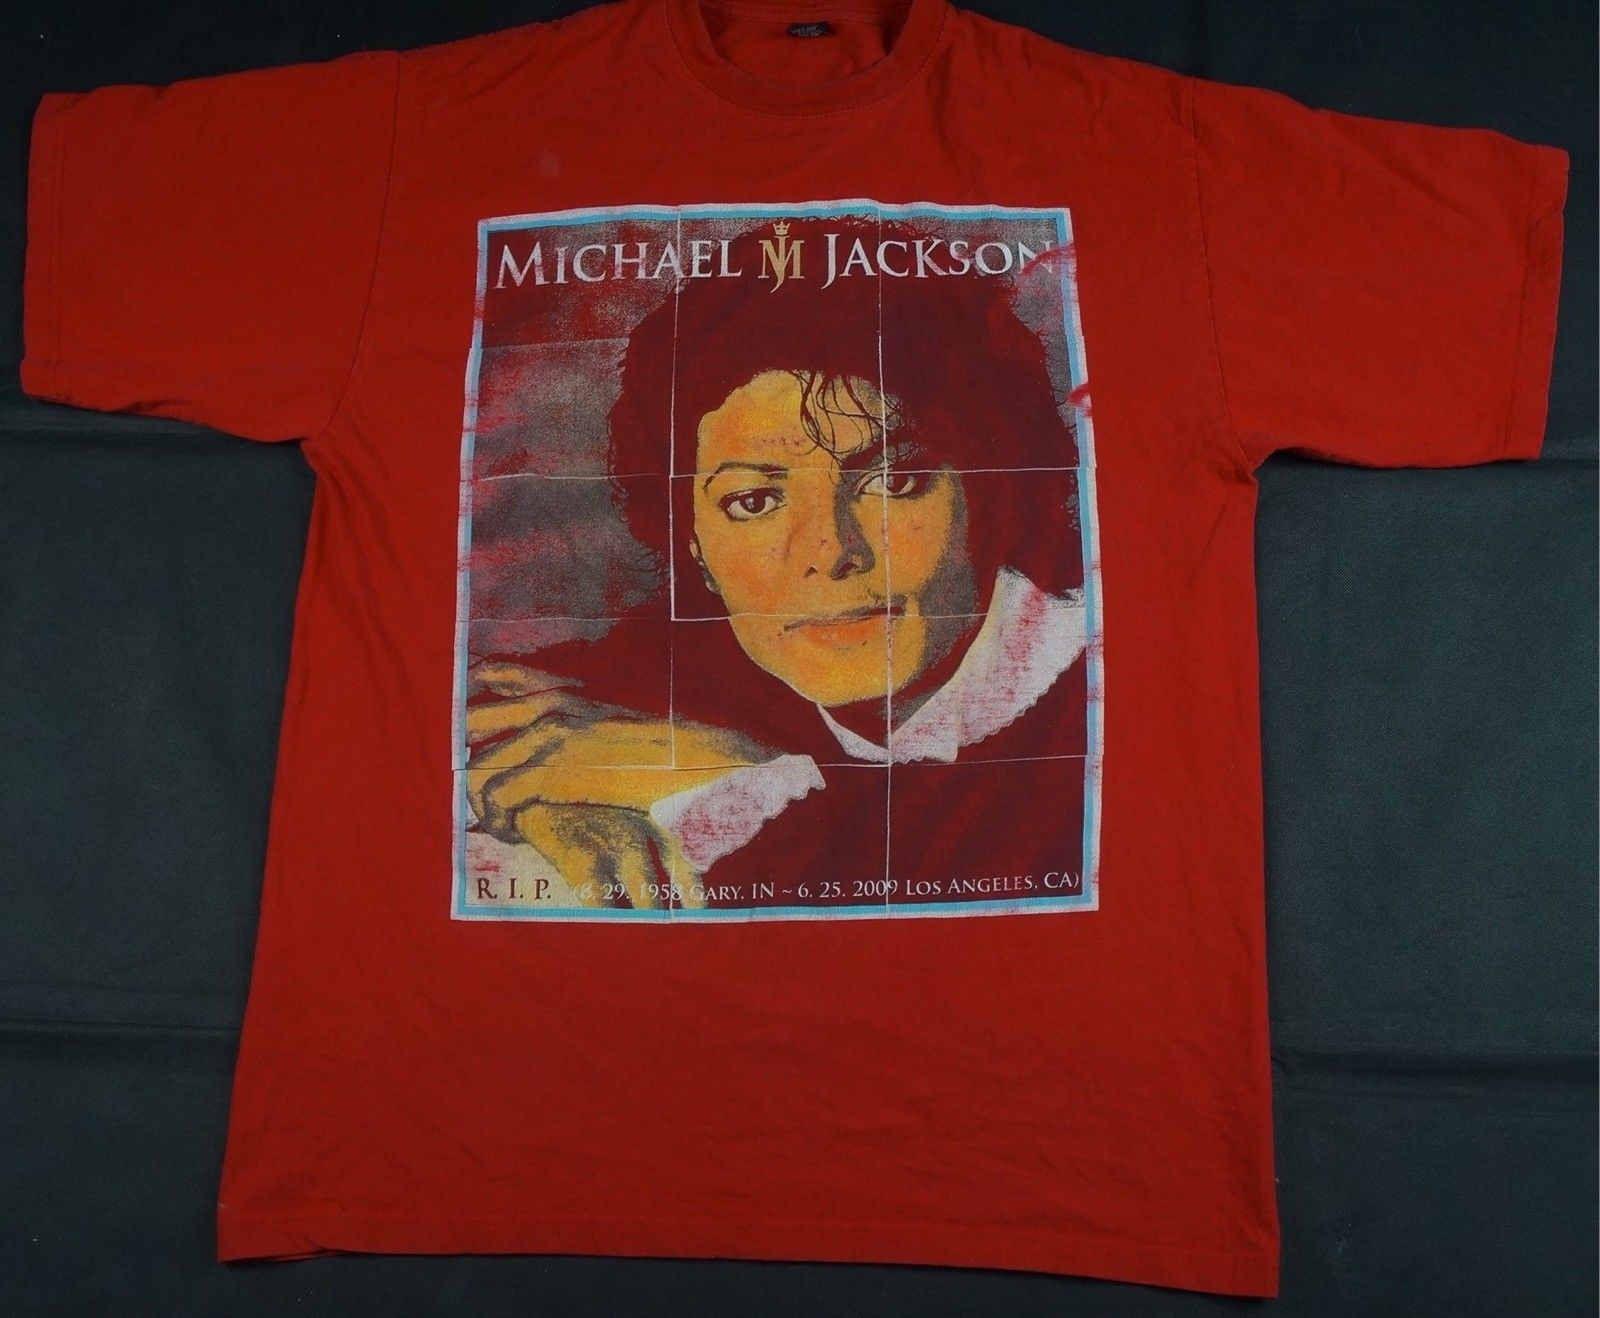 5baa6b68 Rare Vintage NOIZ Michael Jackson Memorial T Shirt RIP MJ King Of Pop Red  SZ 2XL Best Funny Shirts Funny Print Shirts From Tshirtee, $10.68|  DHgate.Com